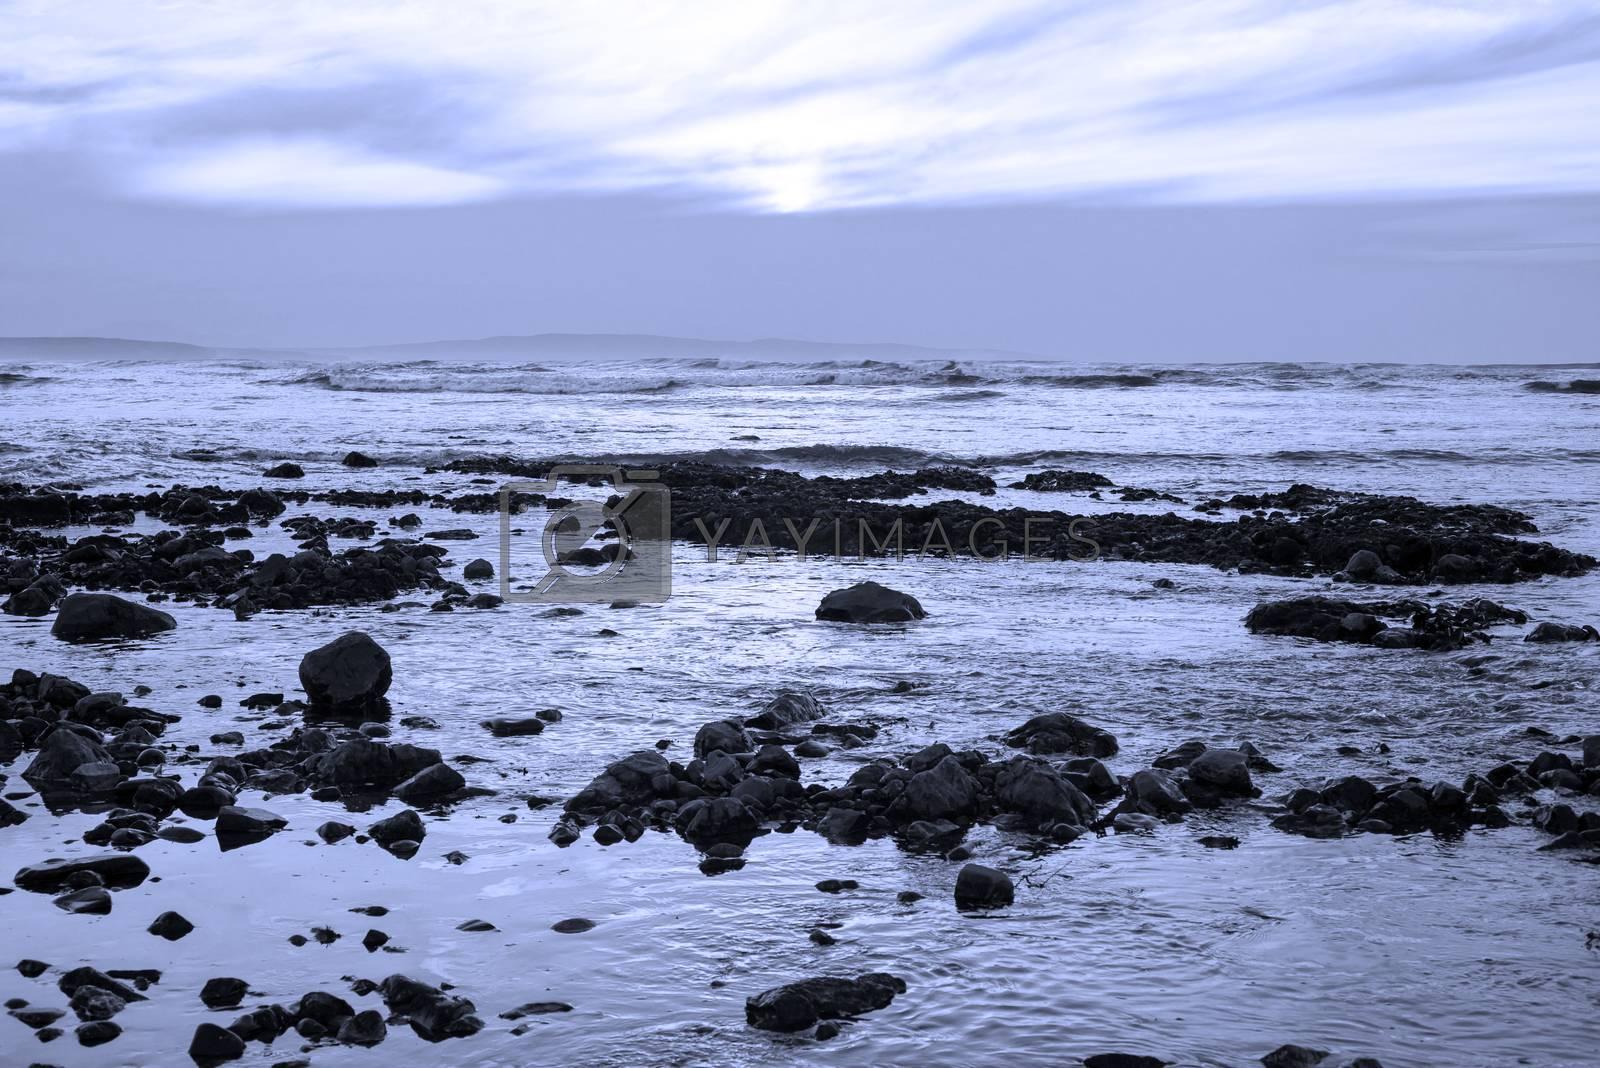 reflections at rocky beach near ballybunion on the wild atlantic way ireland with a beautiful blue tone